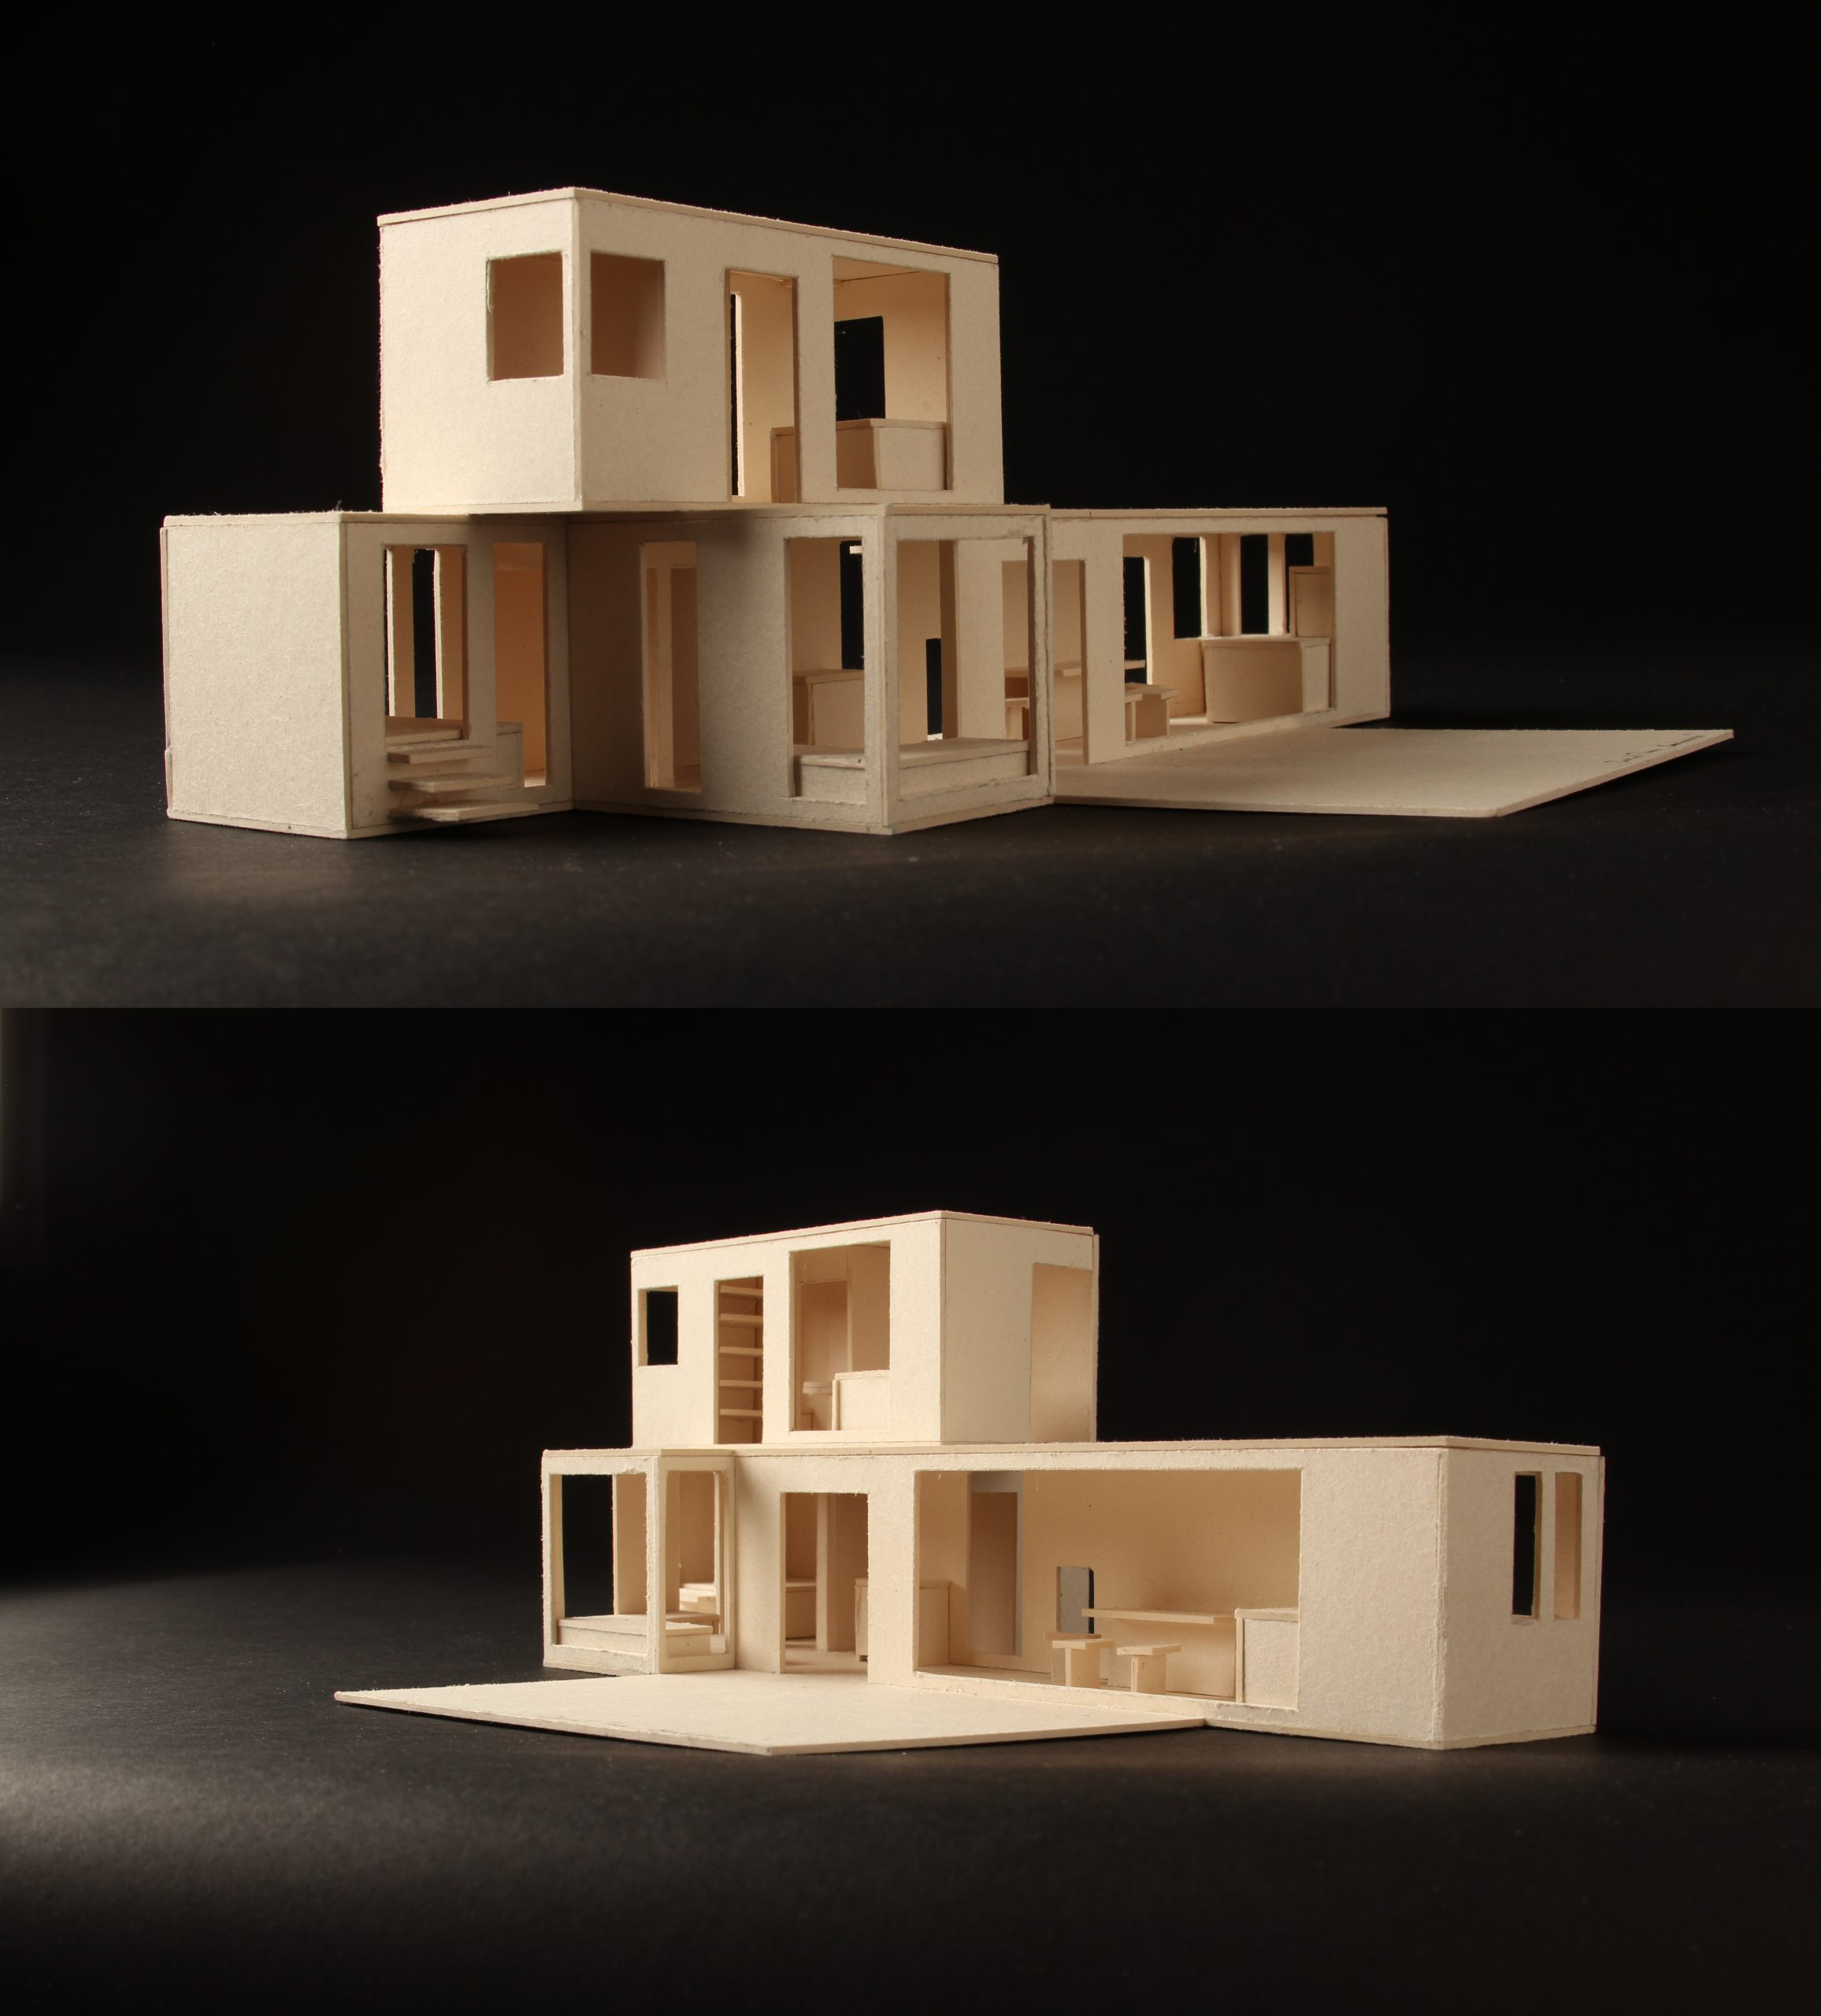 Daniel_Tauer_Projekt_etcpp_Modell_02